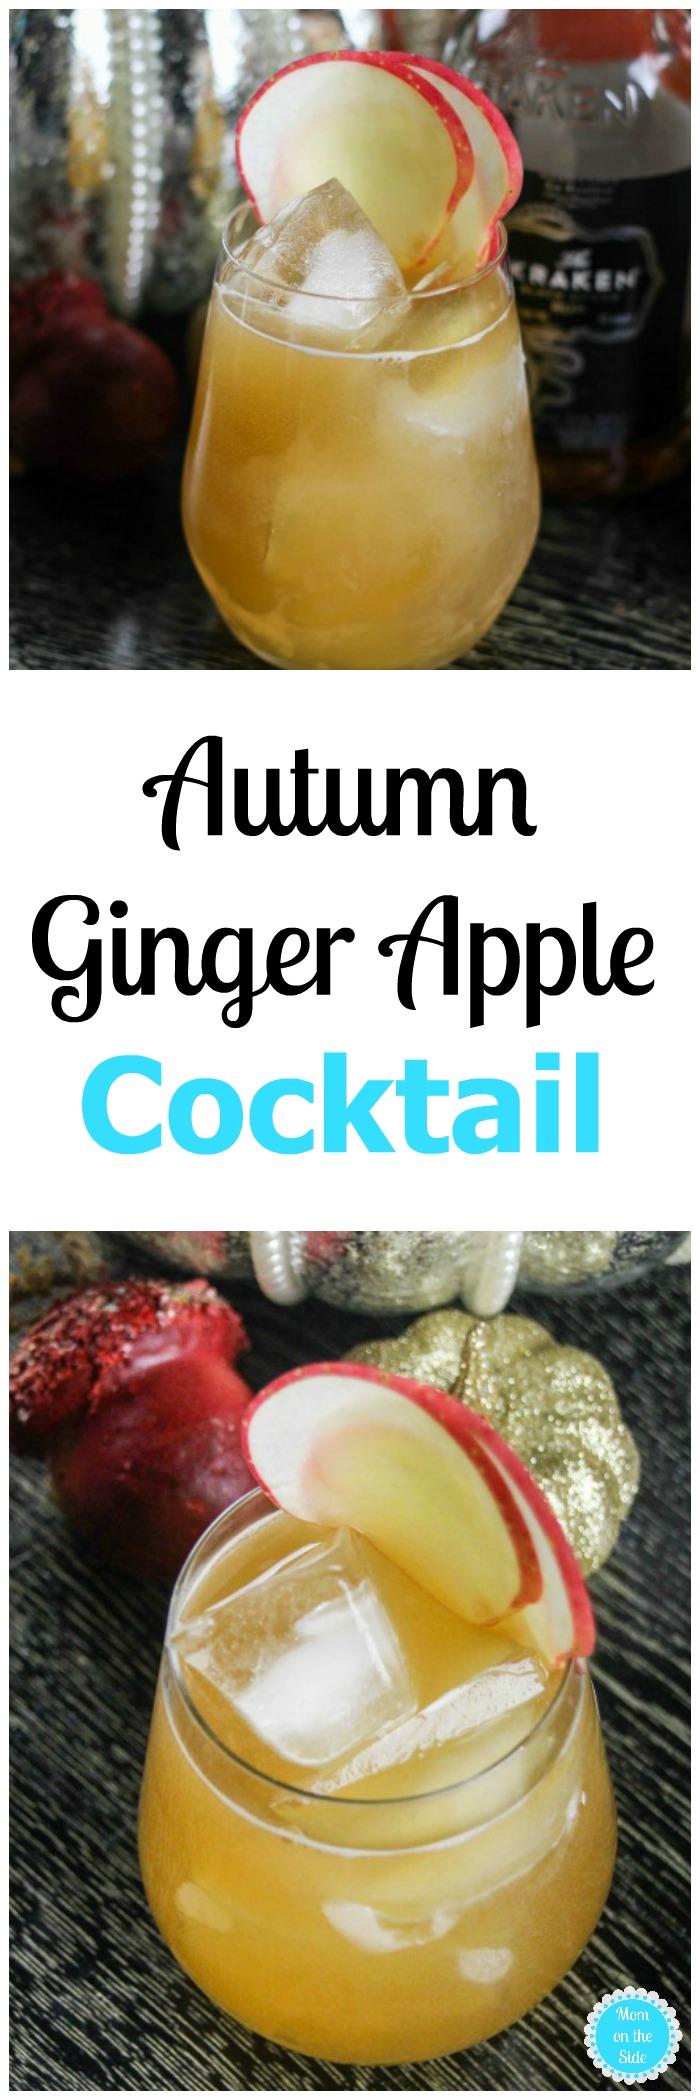 Autumn Ginger Apple Cocktail Recipe